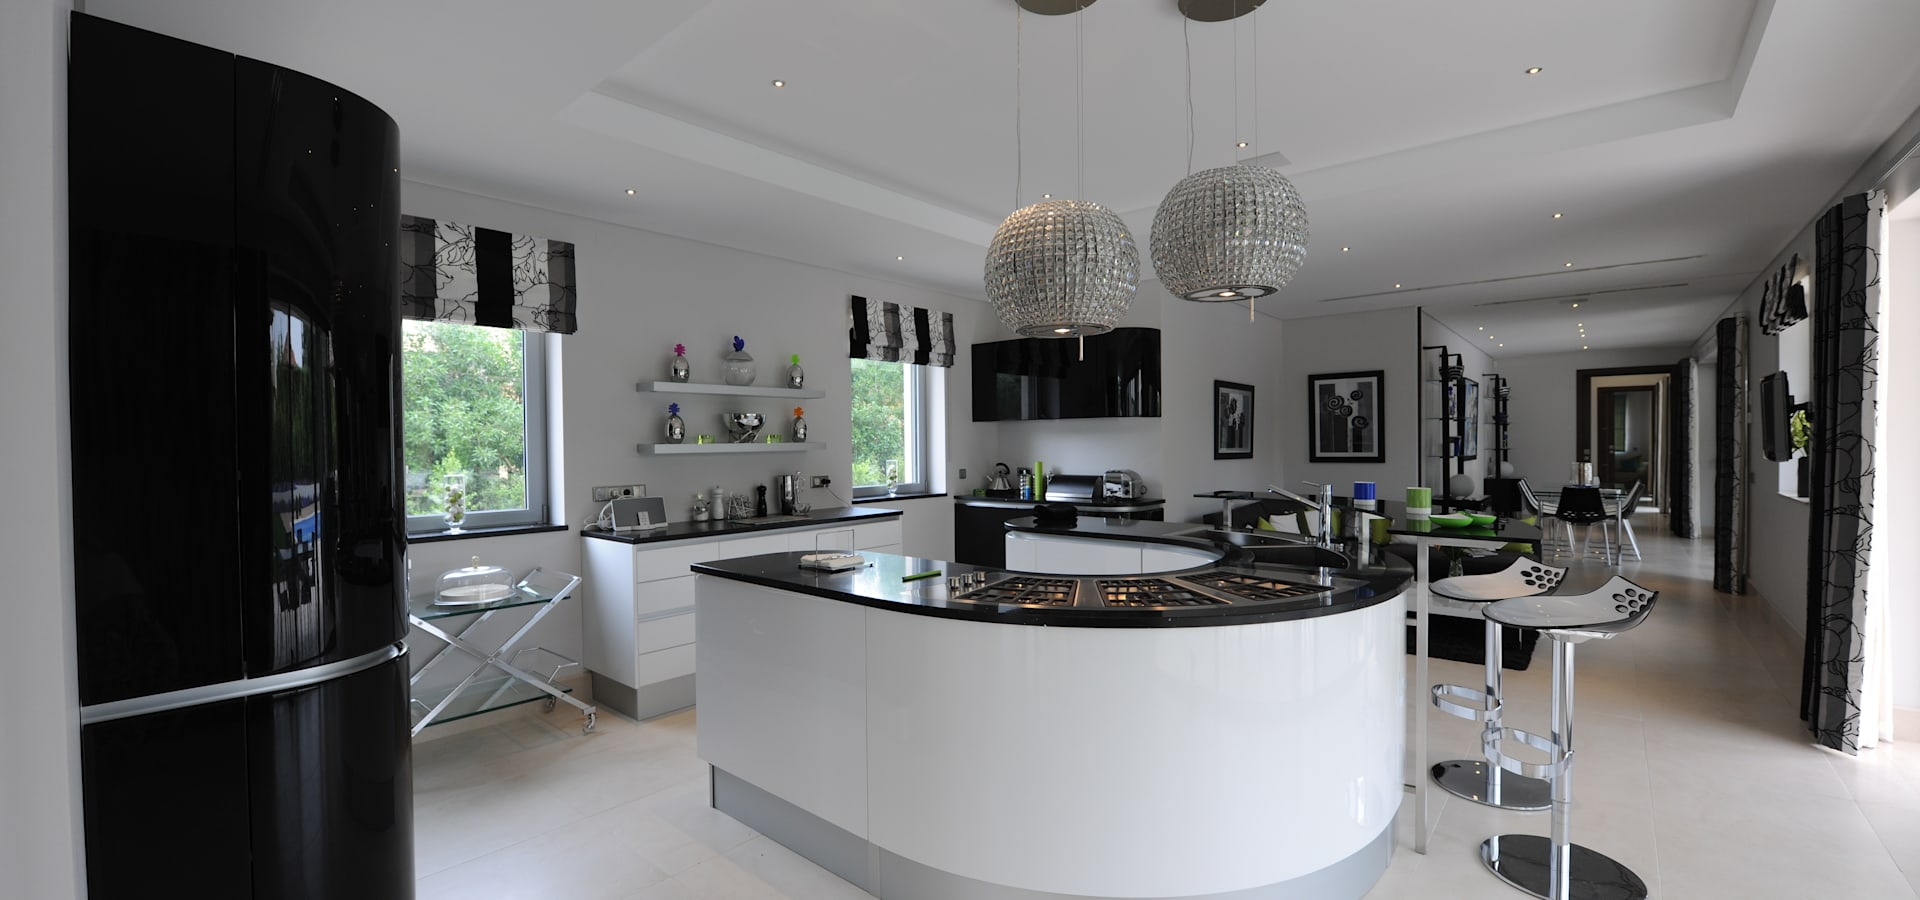 Cheryl tarbuck design decoratori d 39 interni a london homify - Decoratori d interni ...